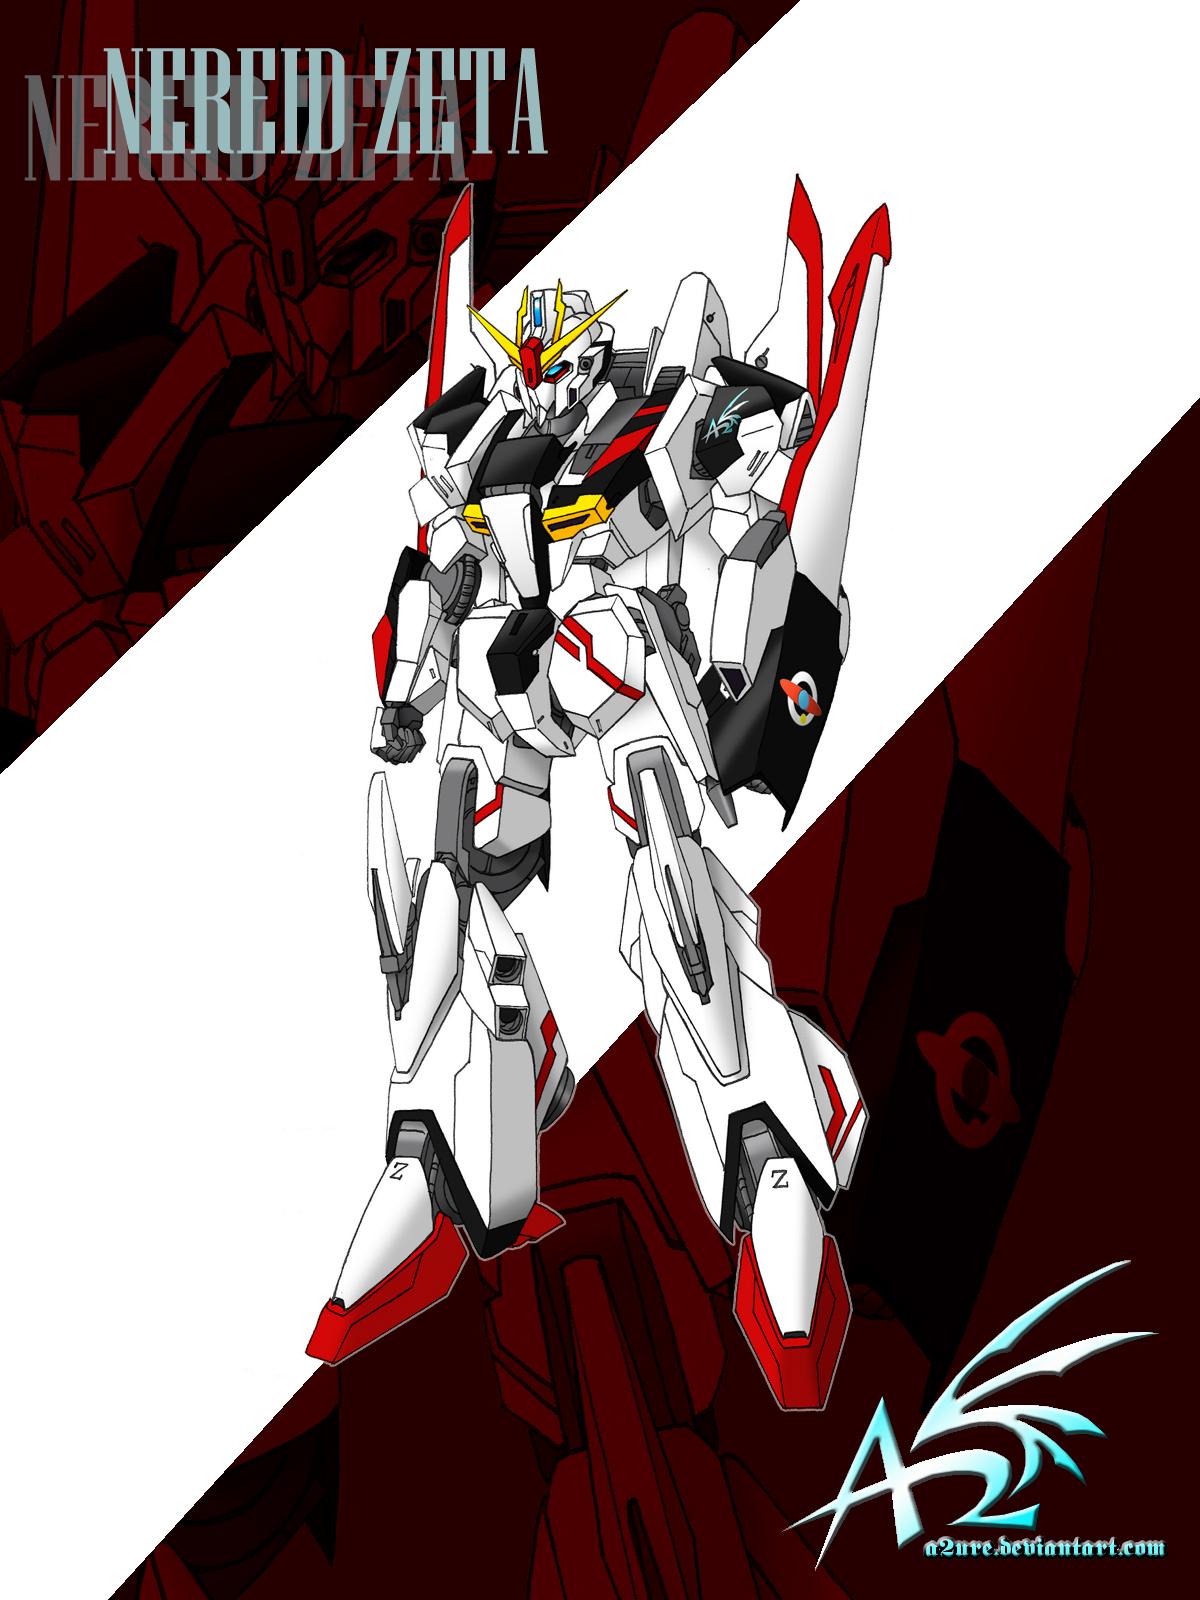 Nereid Zeta Gundam by a2ure